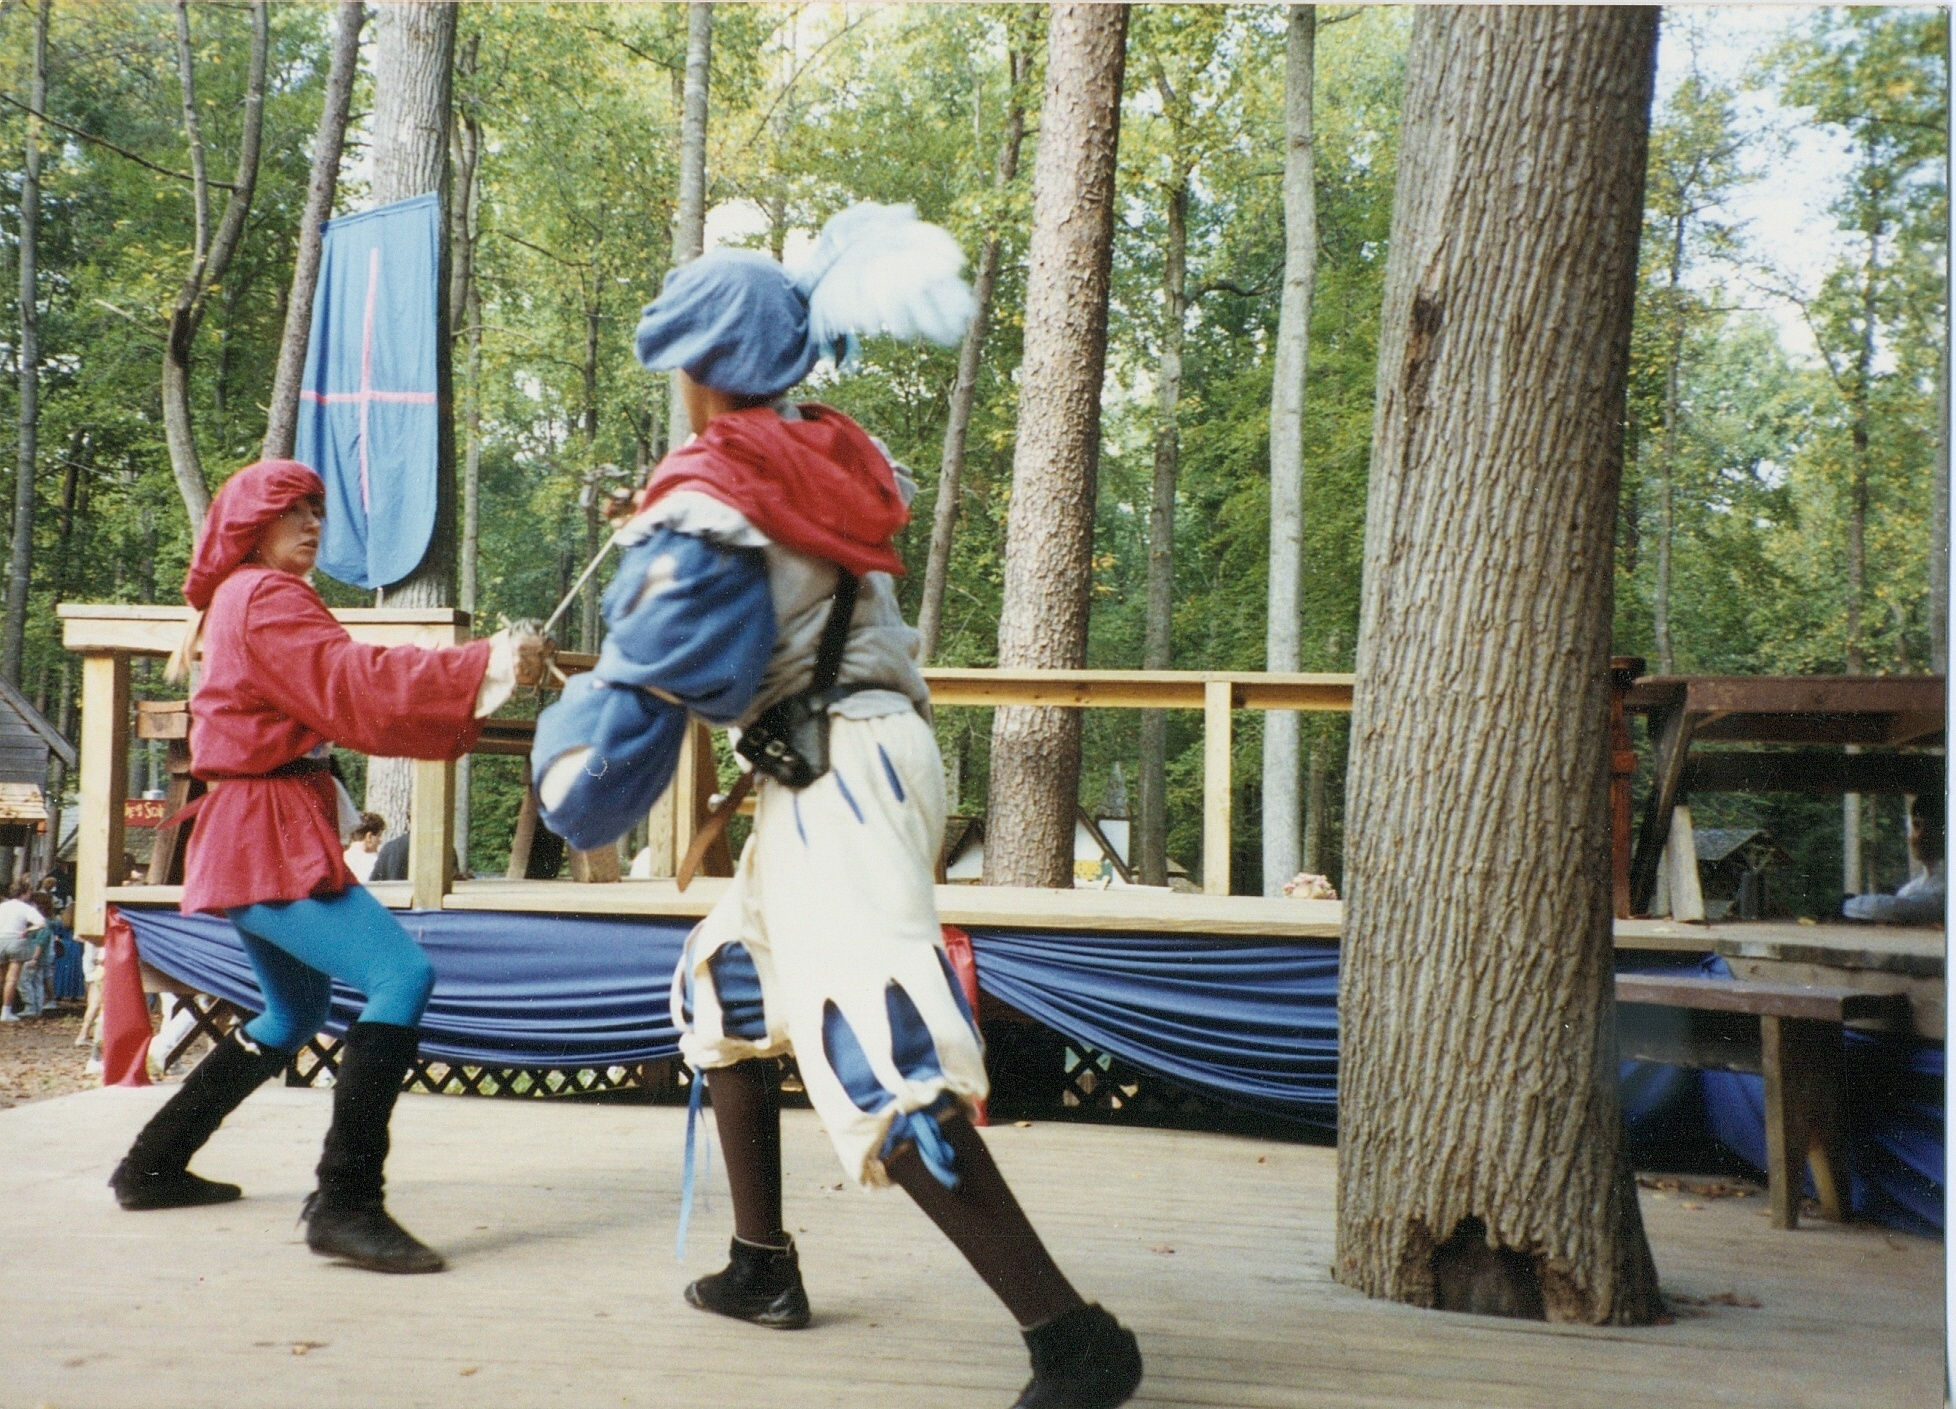 Renaissance Sword Play